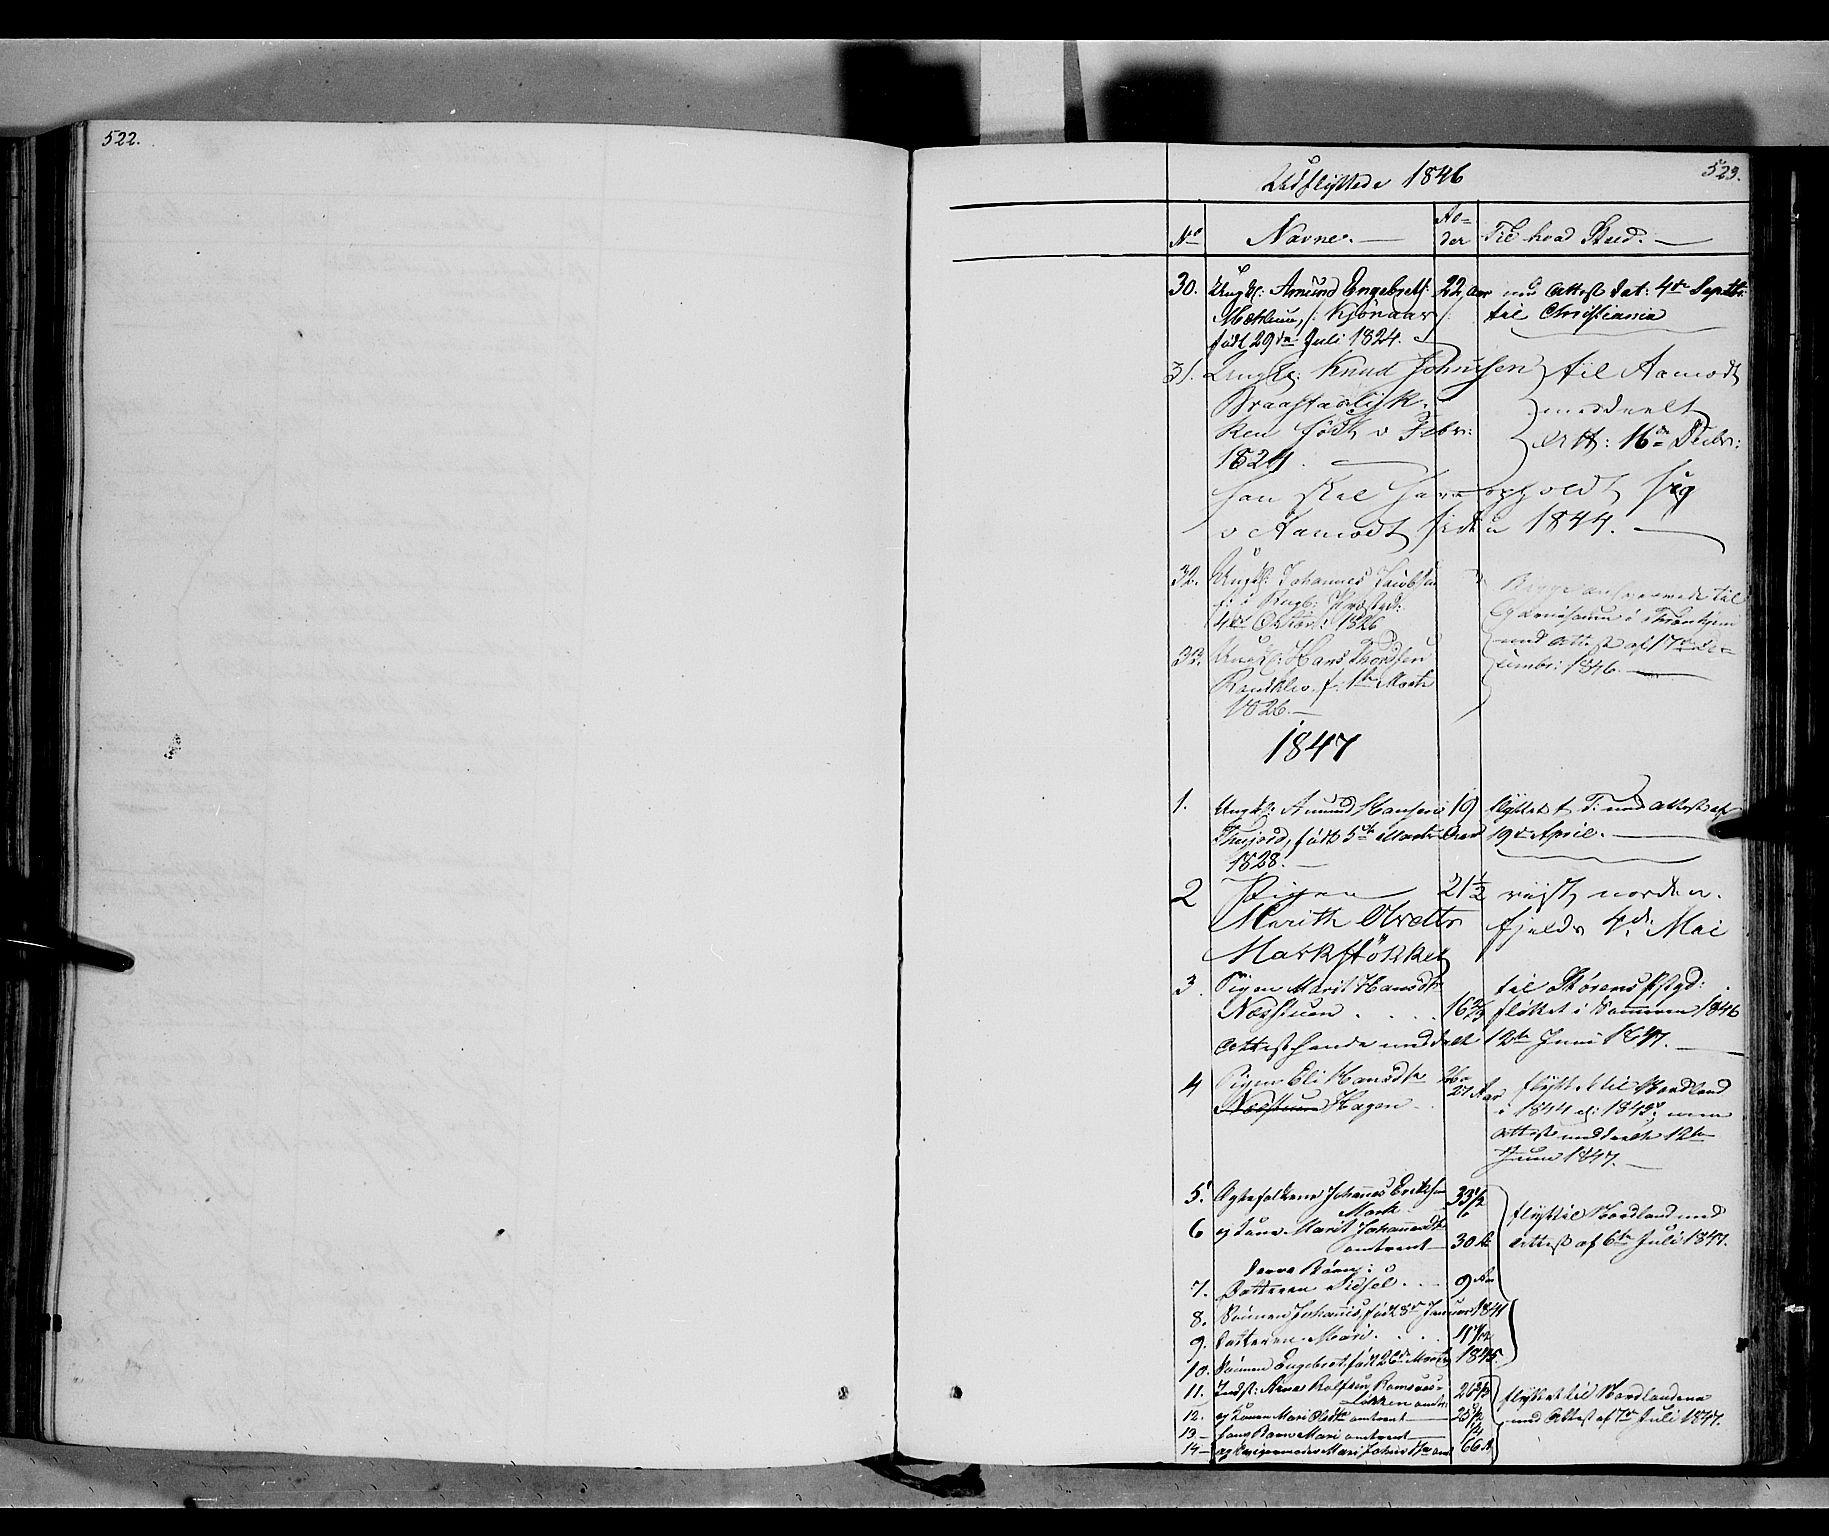 SAH, Ringebu prestekontor, Ministerialbok nr. 5, 1839-1848, s. 522-523